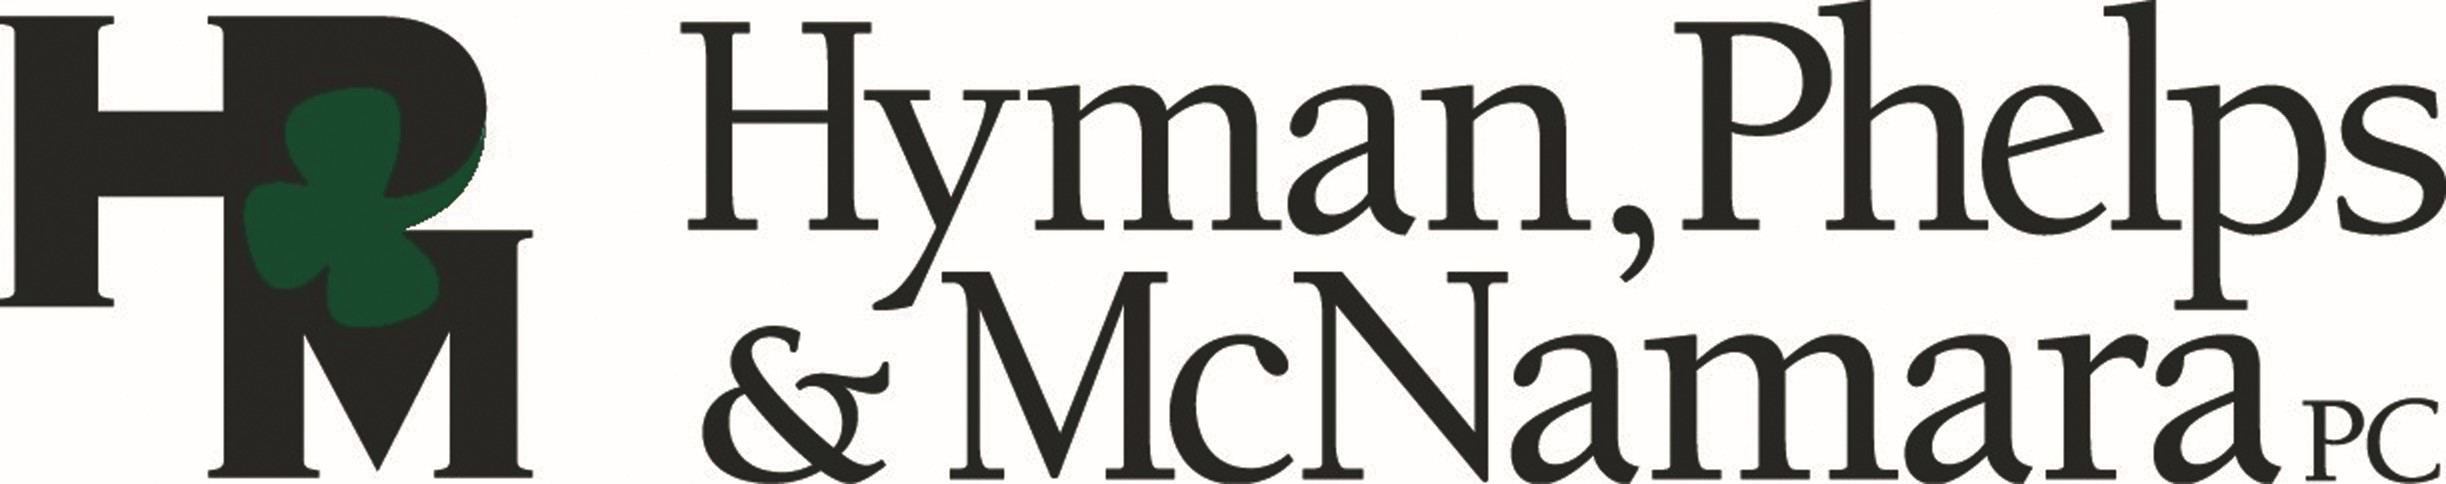 Hyman, Phelps & McNamara, P.C.